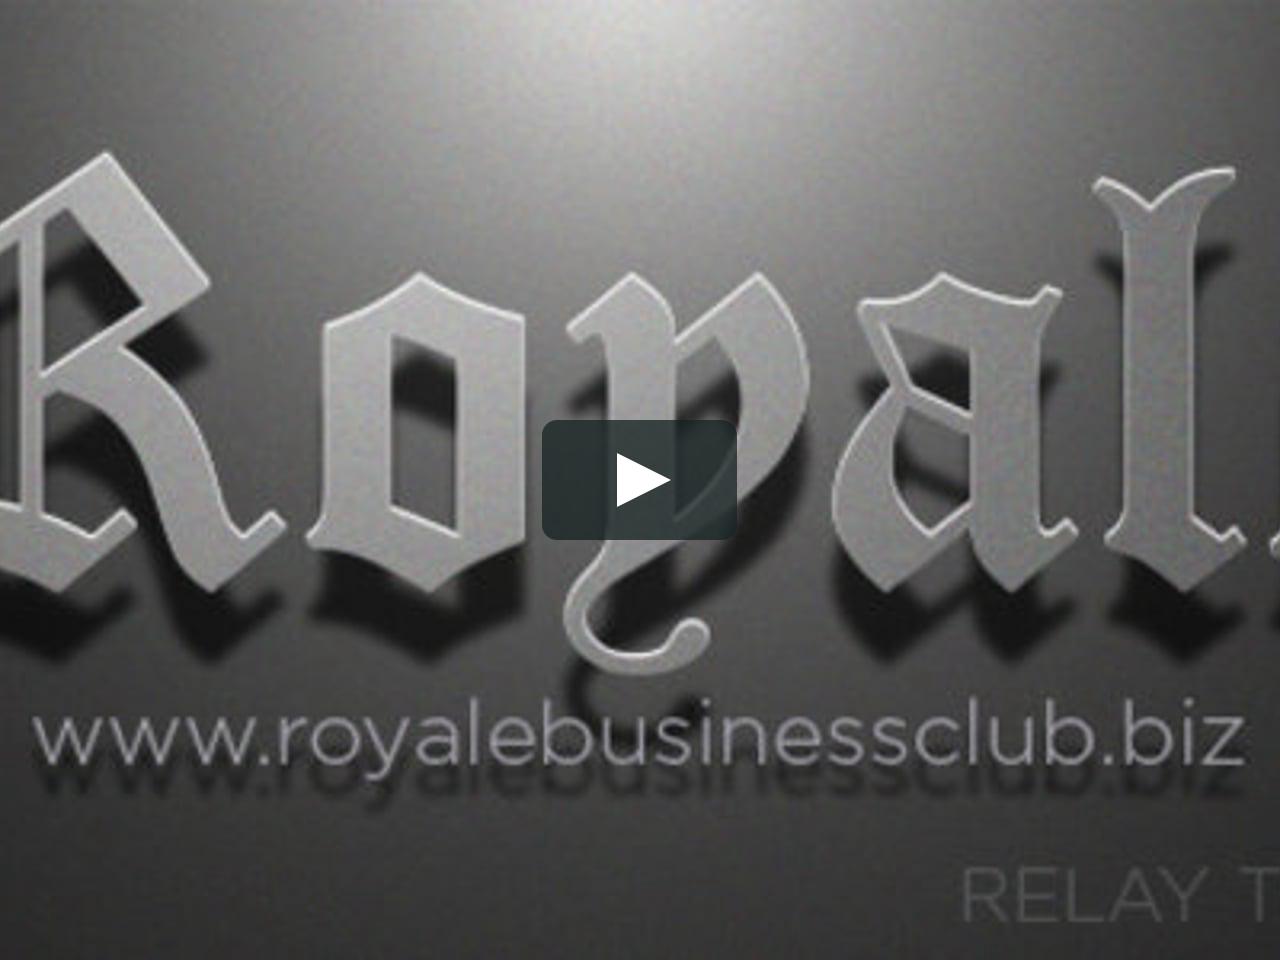 royale business presentation vimeo on demand